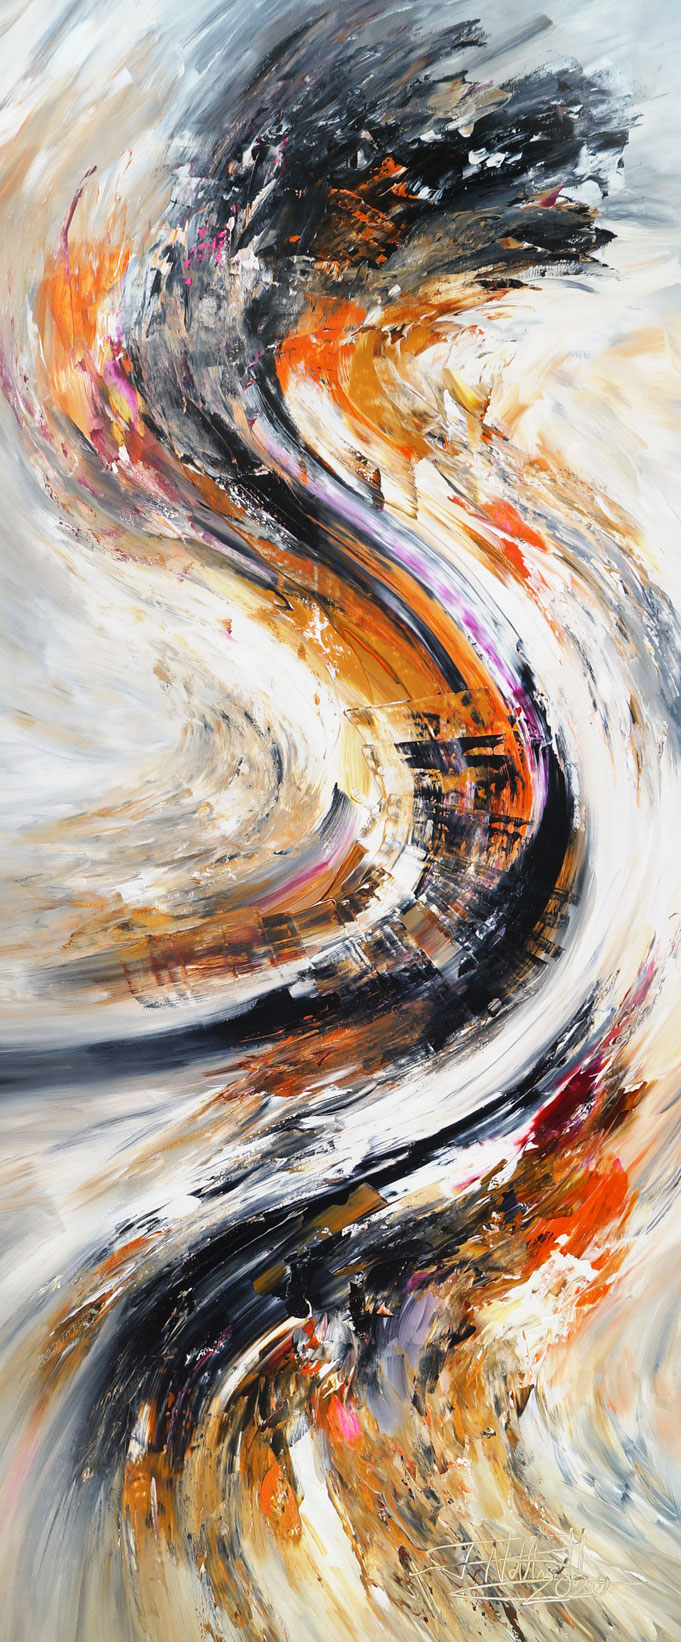 großes, abstraktes Gemälde. Modernes, elegantes Gemäldeformat